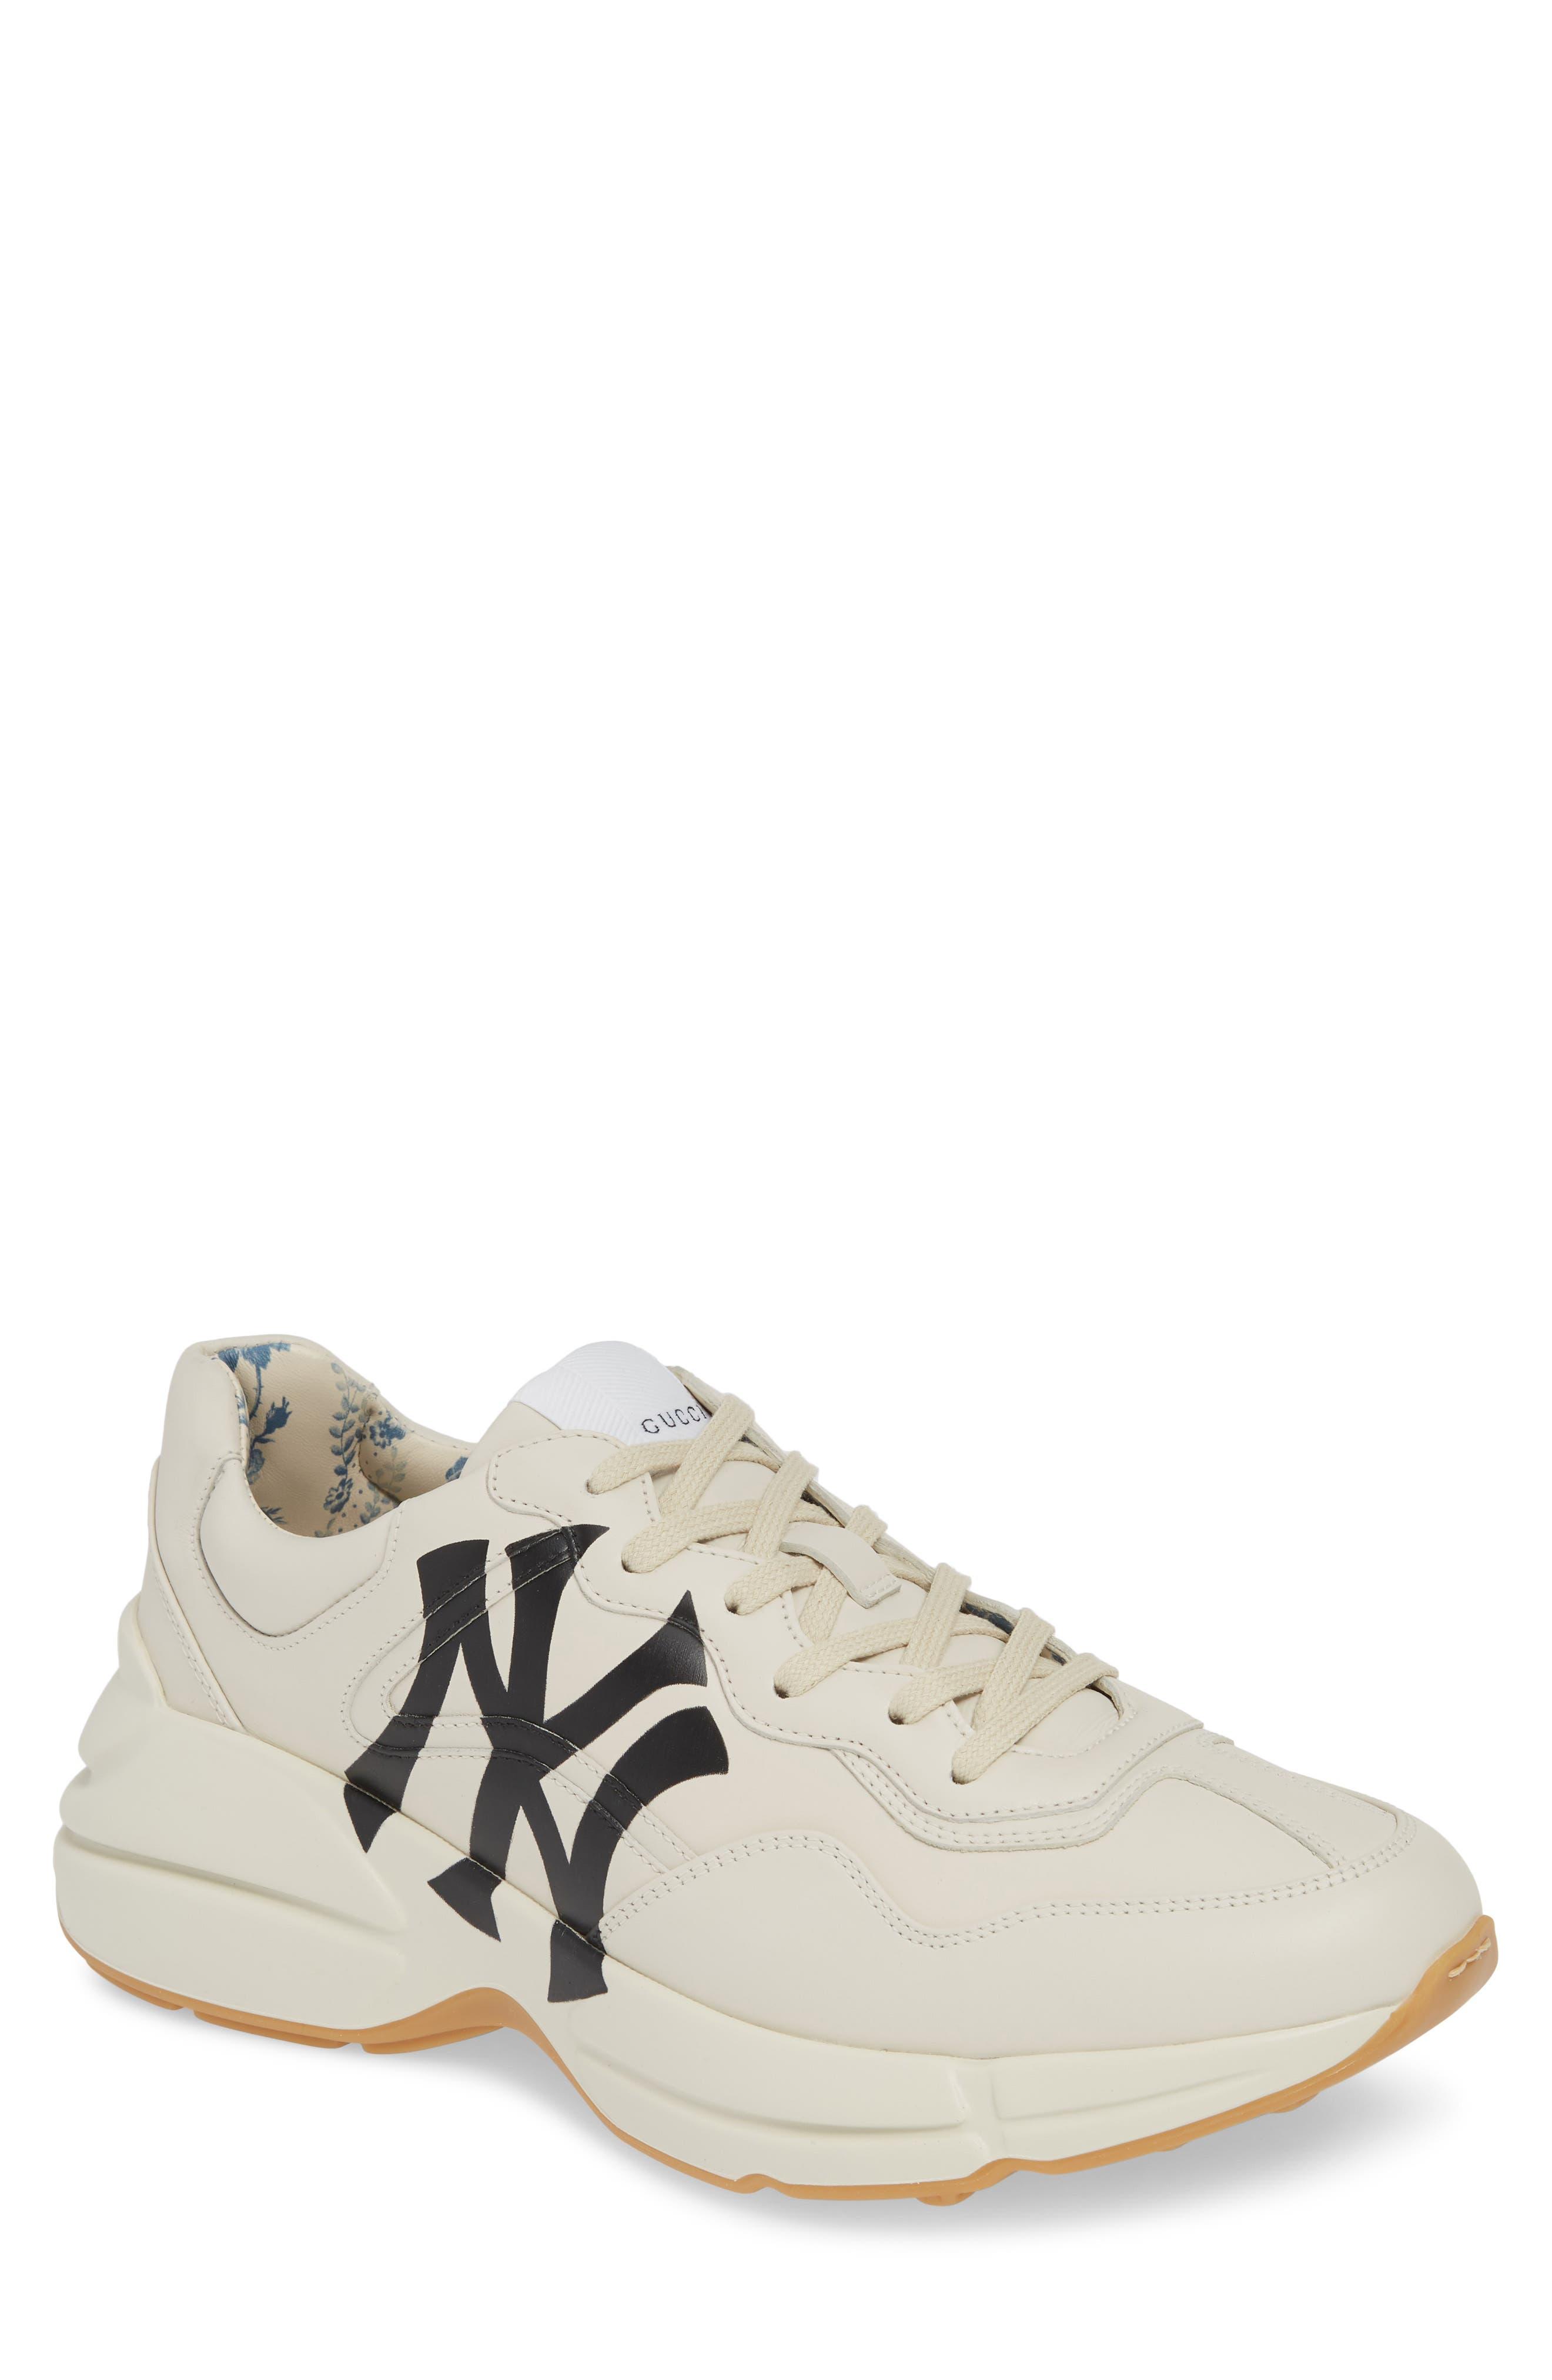 GUCCI, Rhyton Sneaker, Main thumbnail 1, color, MYSTIC WHITE/ WHITE